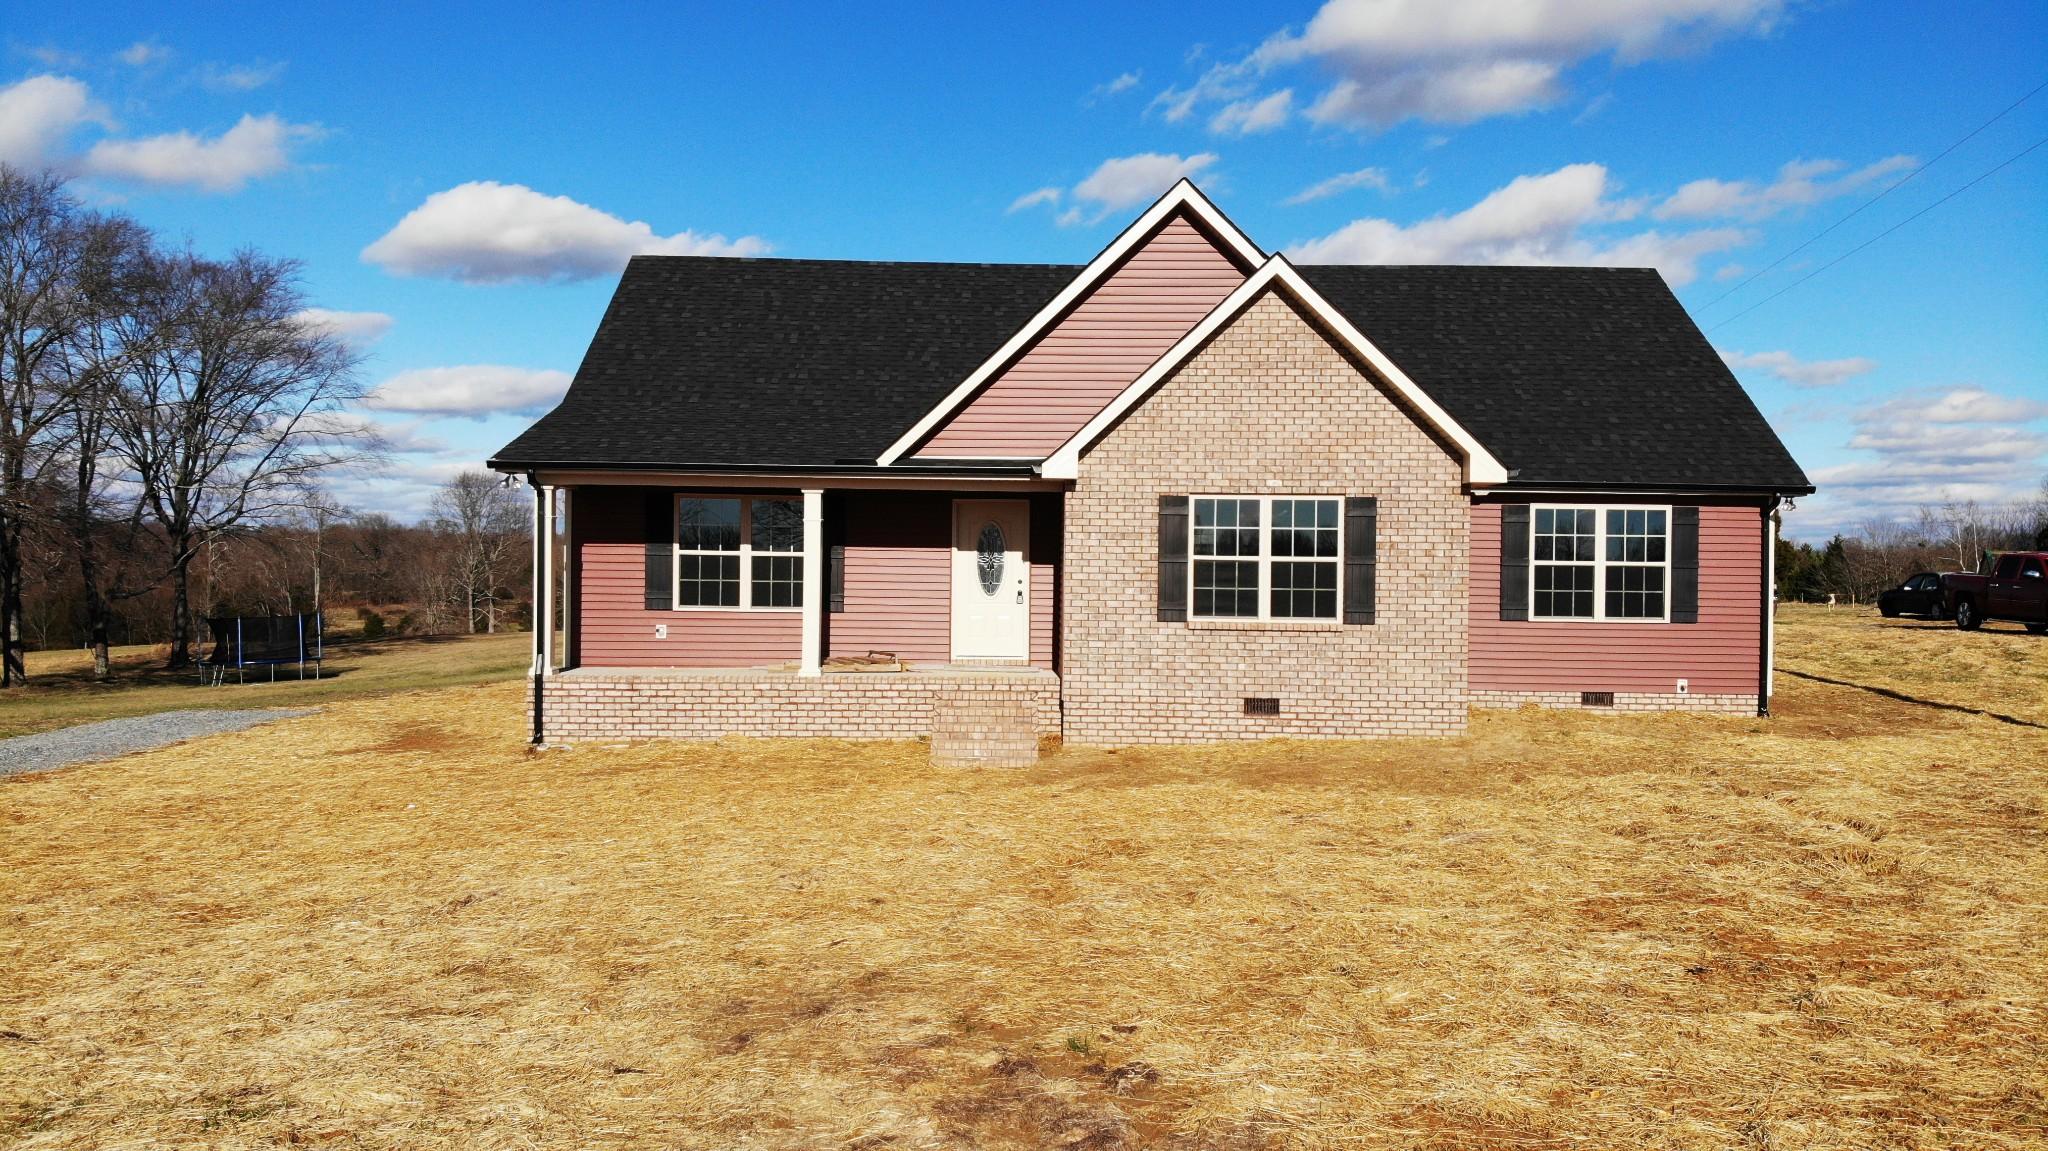 1296 Mt Olive Rd, Westmoreland, TN 37186 - Westmoreland, TN real estate listing